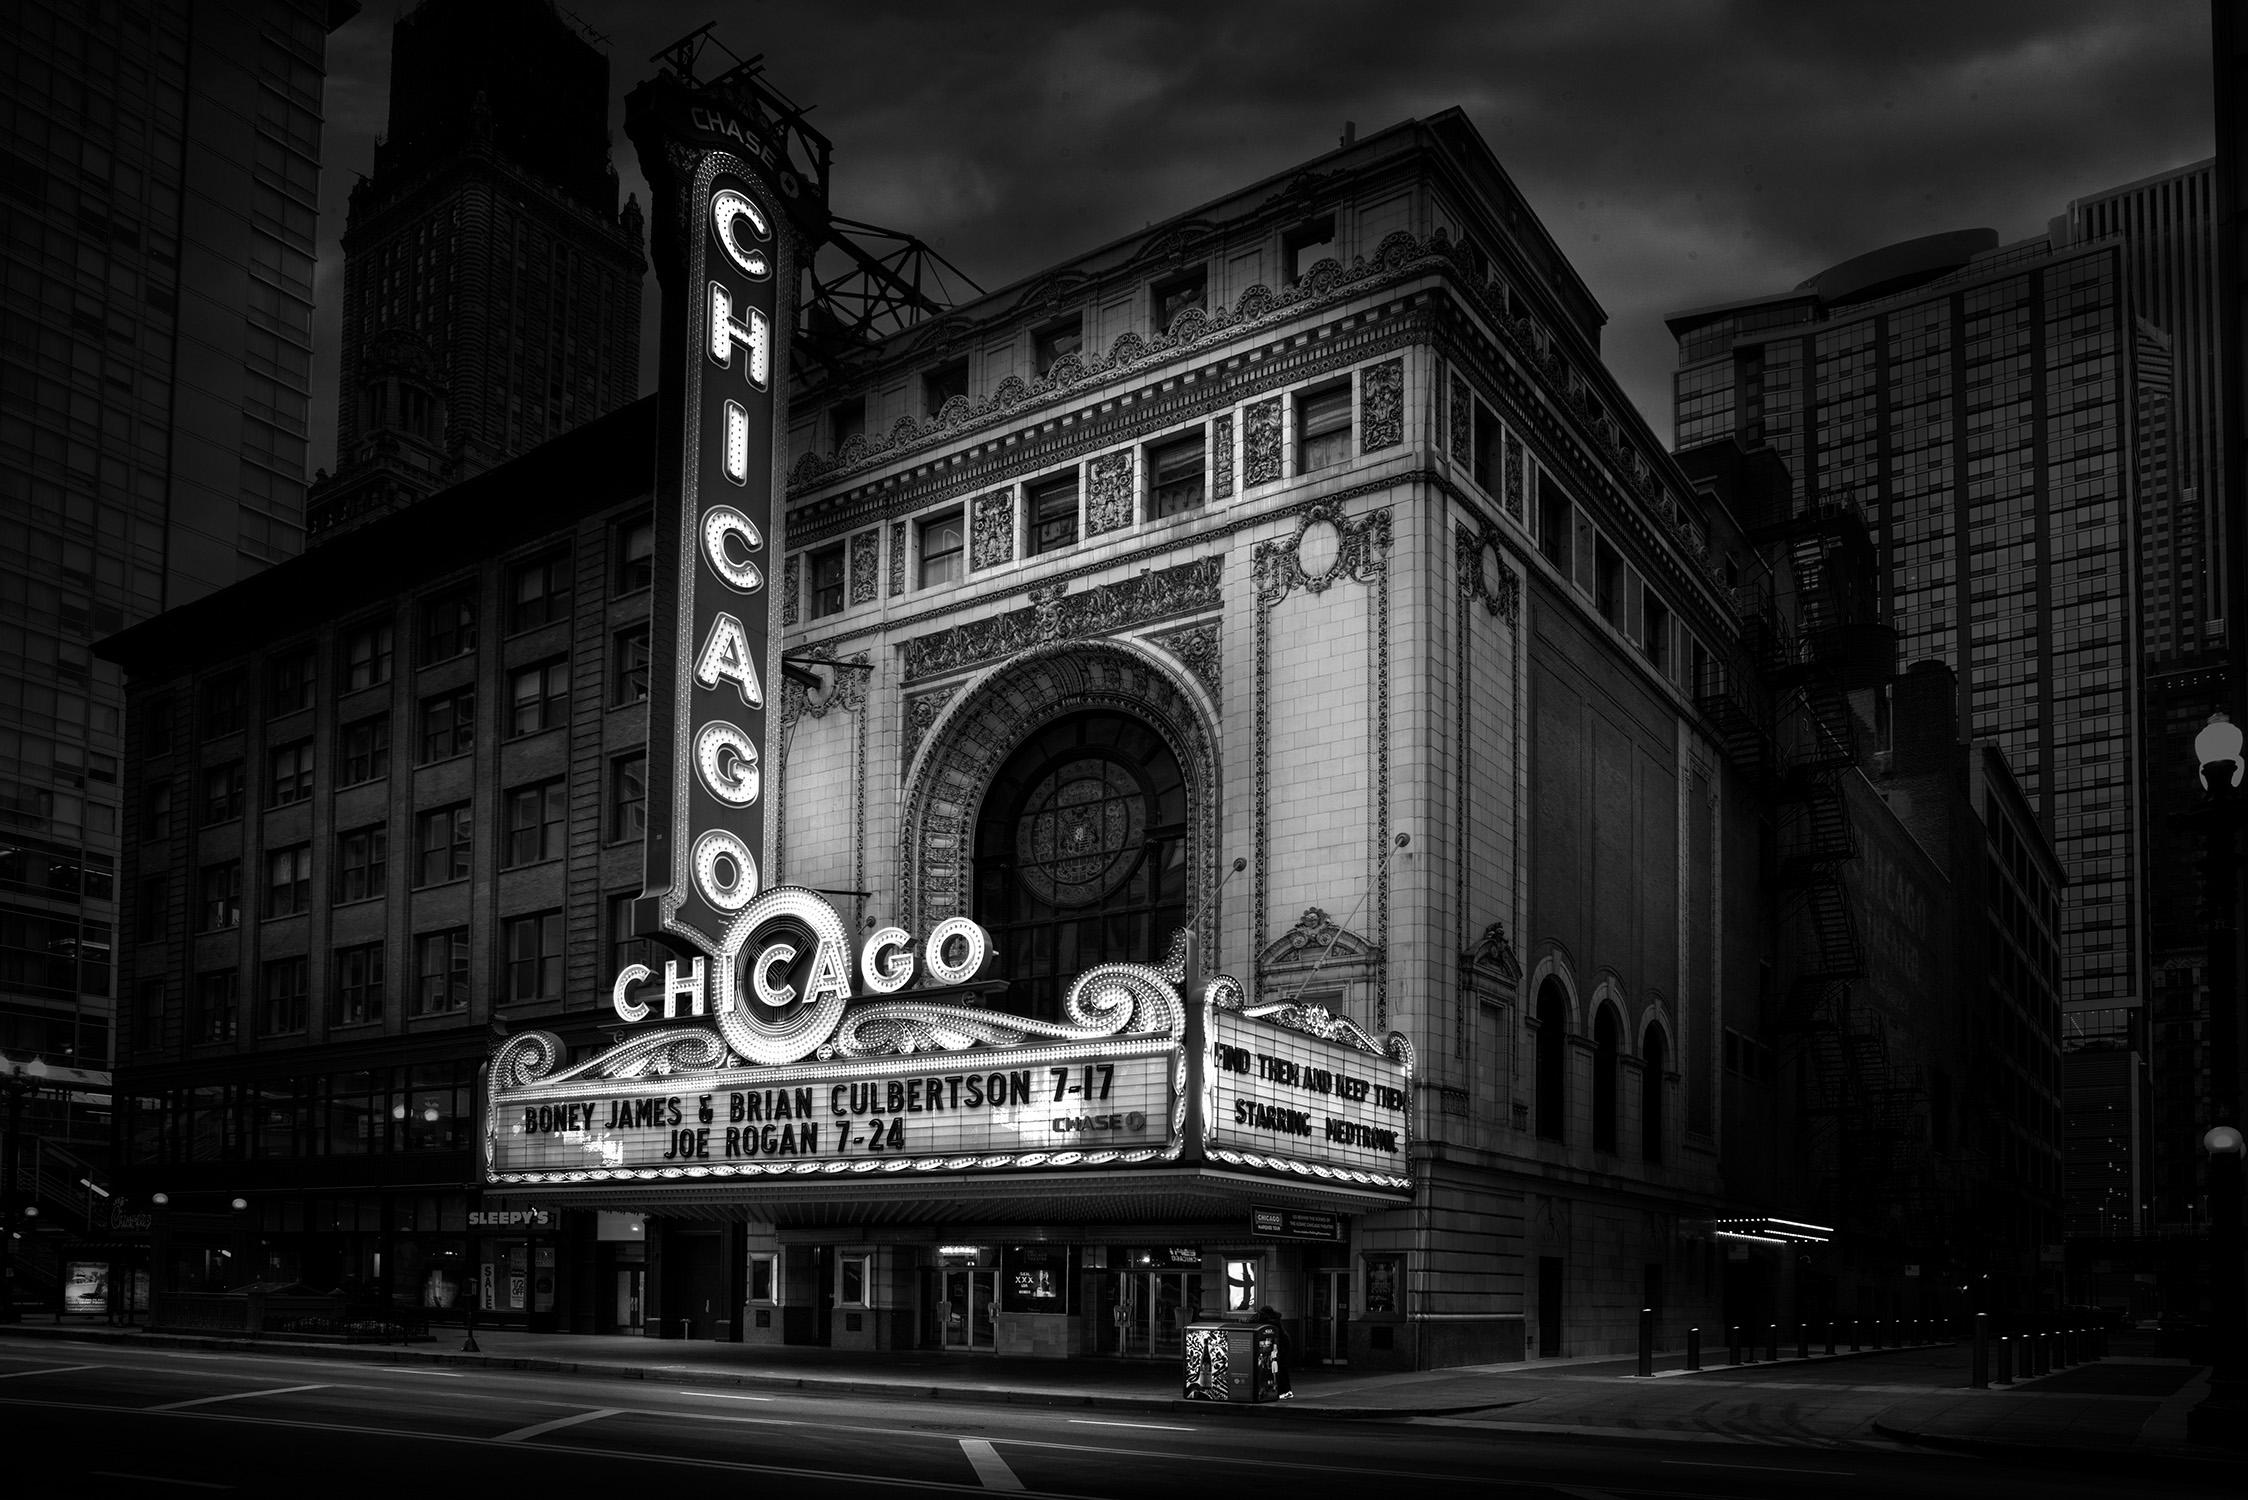 Chicago #8